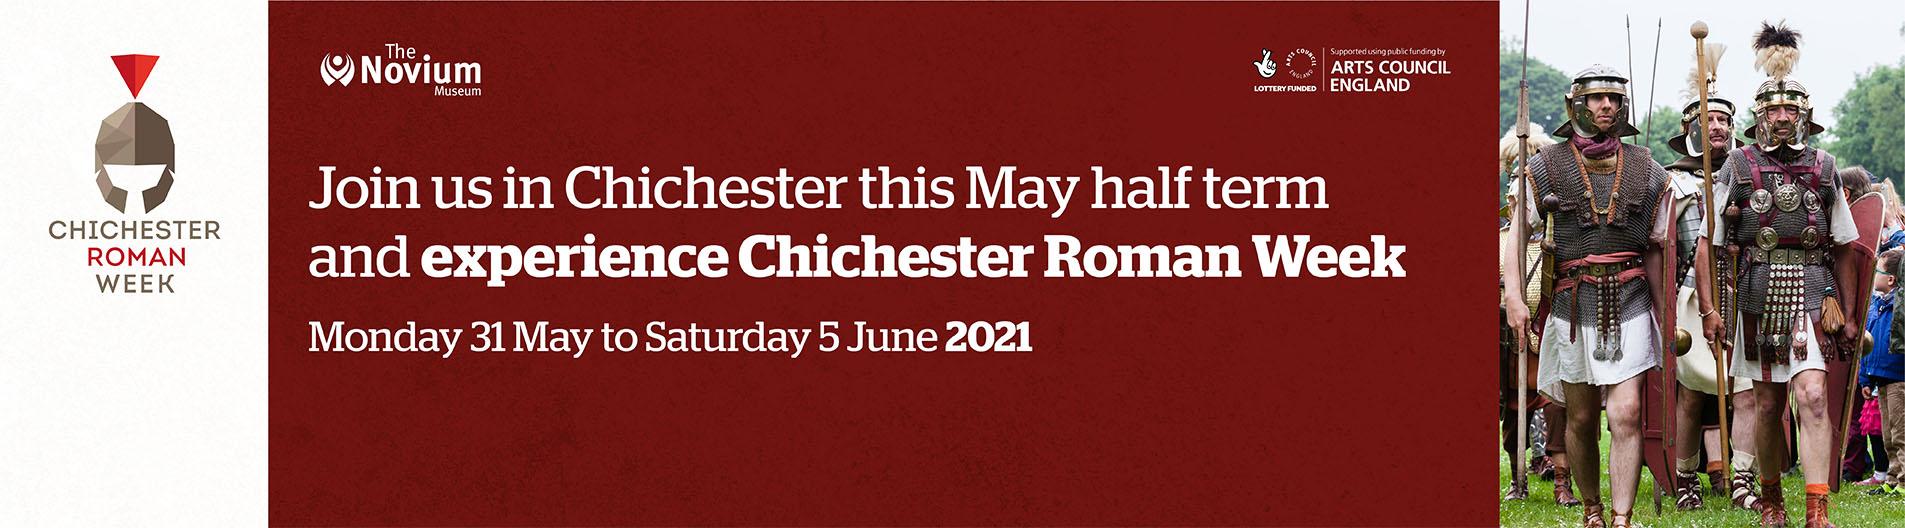 Roman Week – 31 May to 5 June 2021